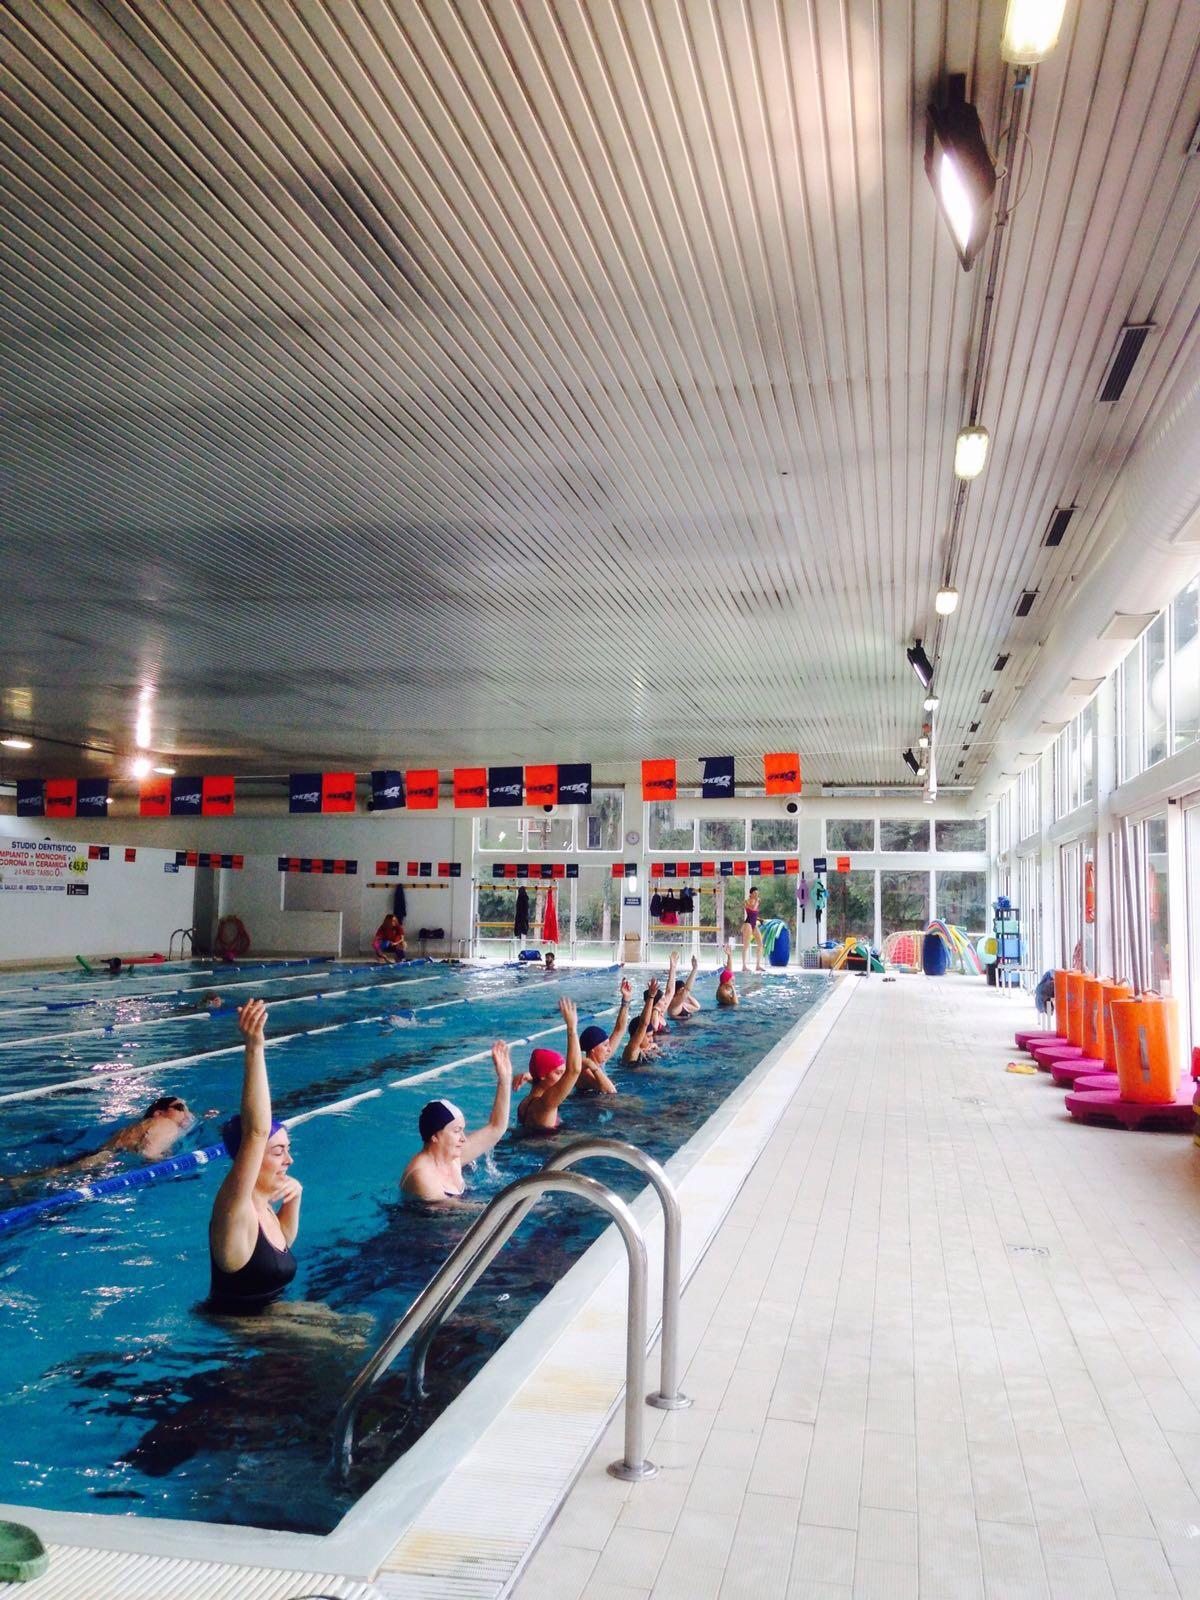 piscina monza triante